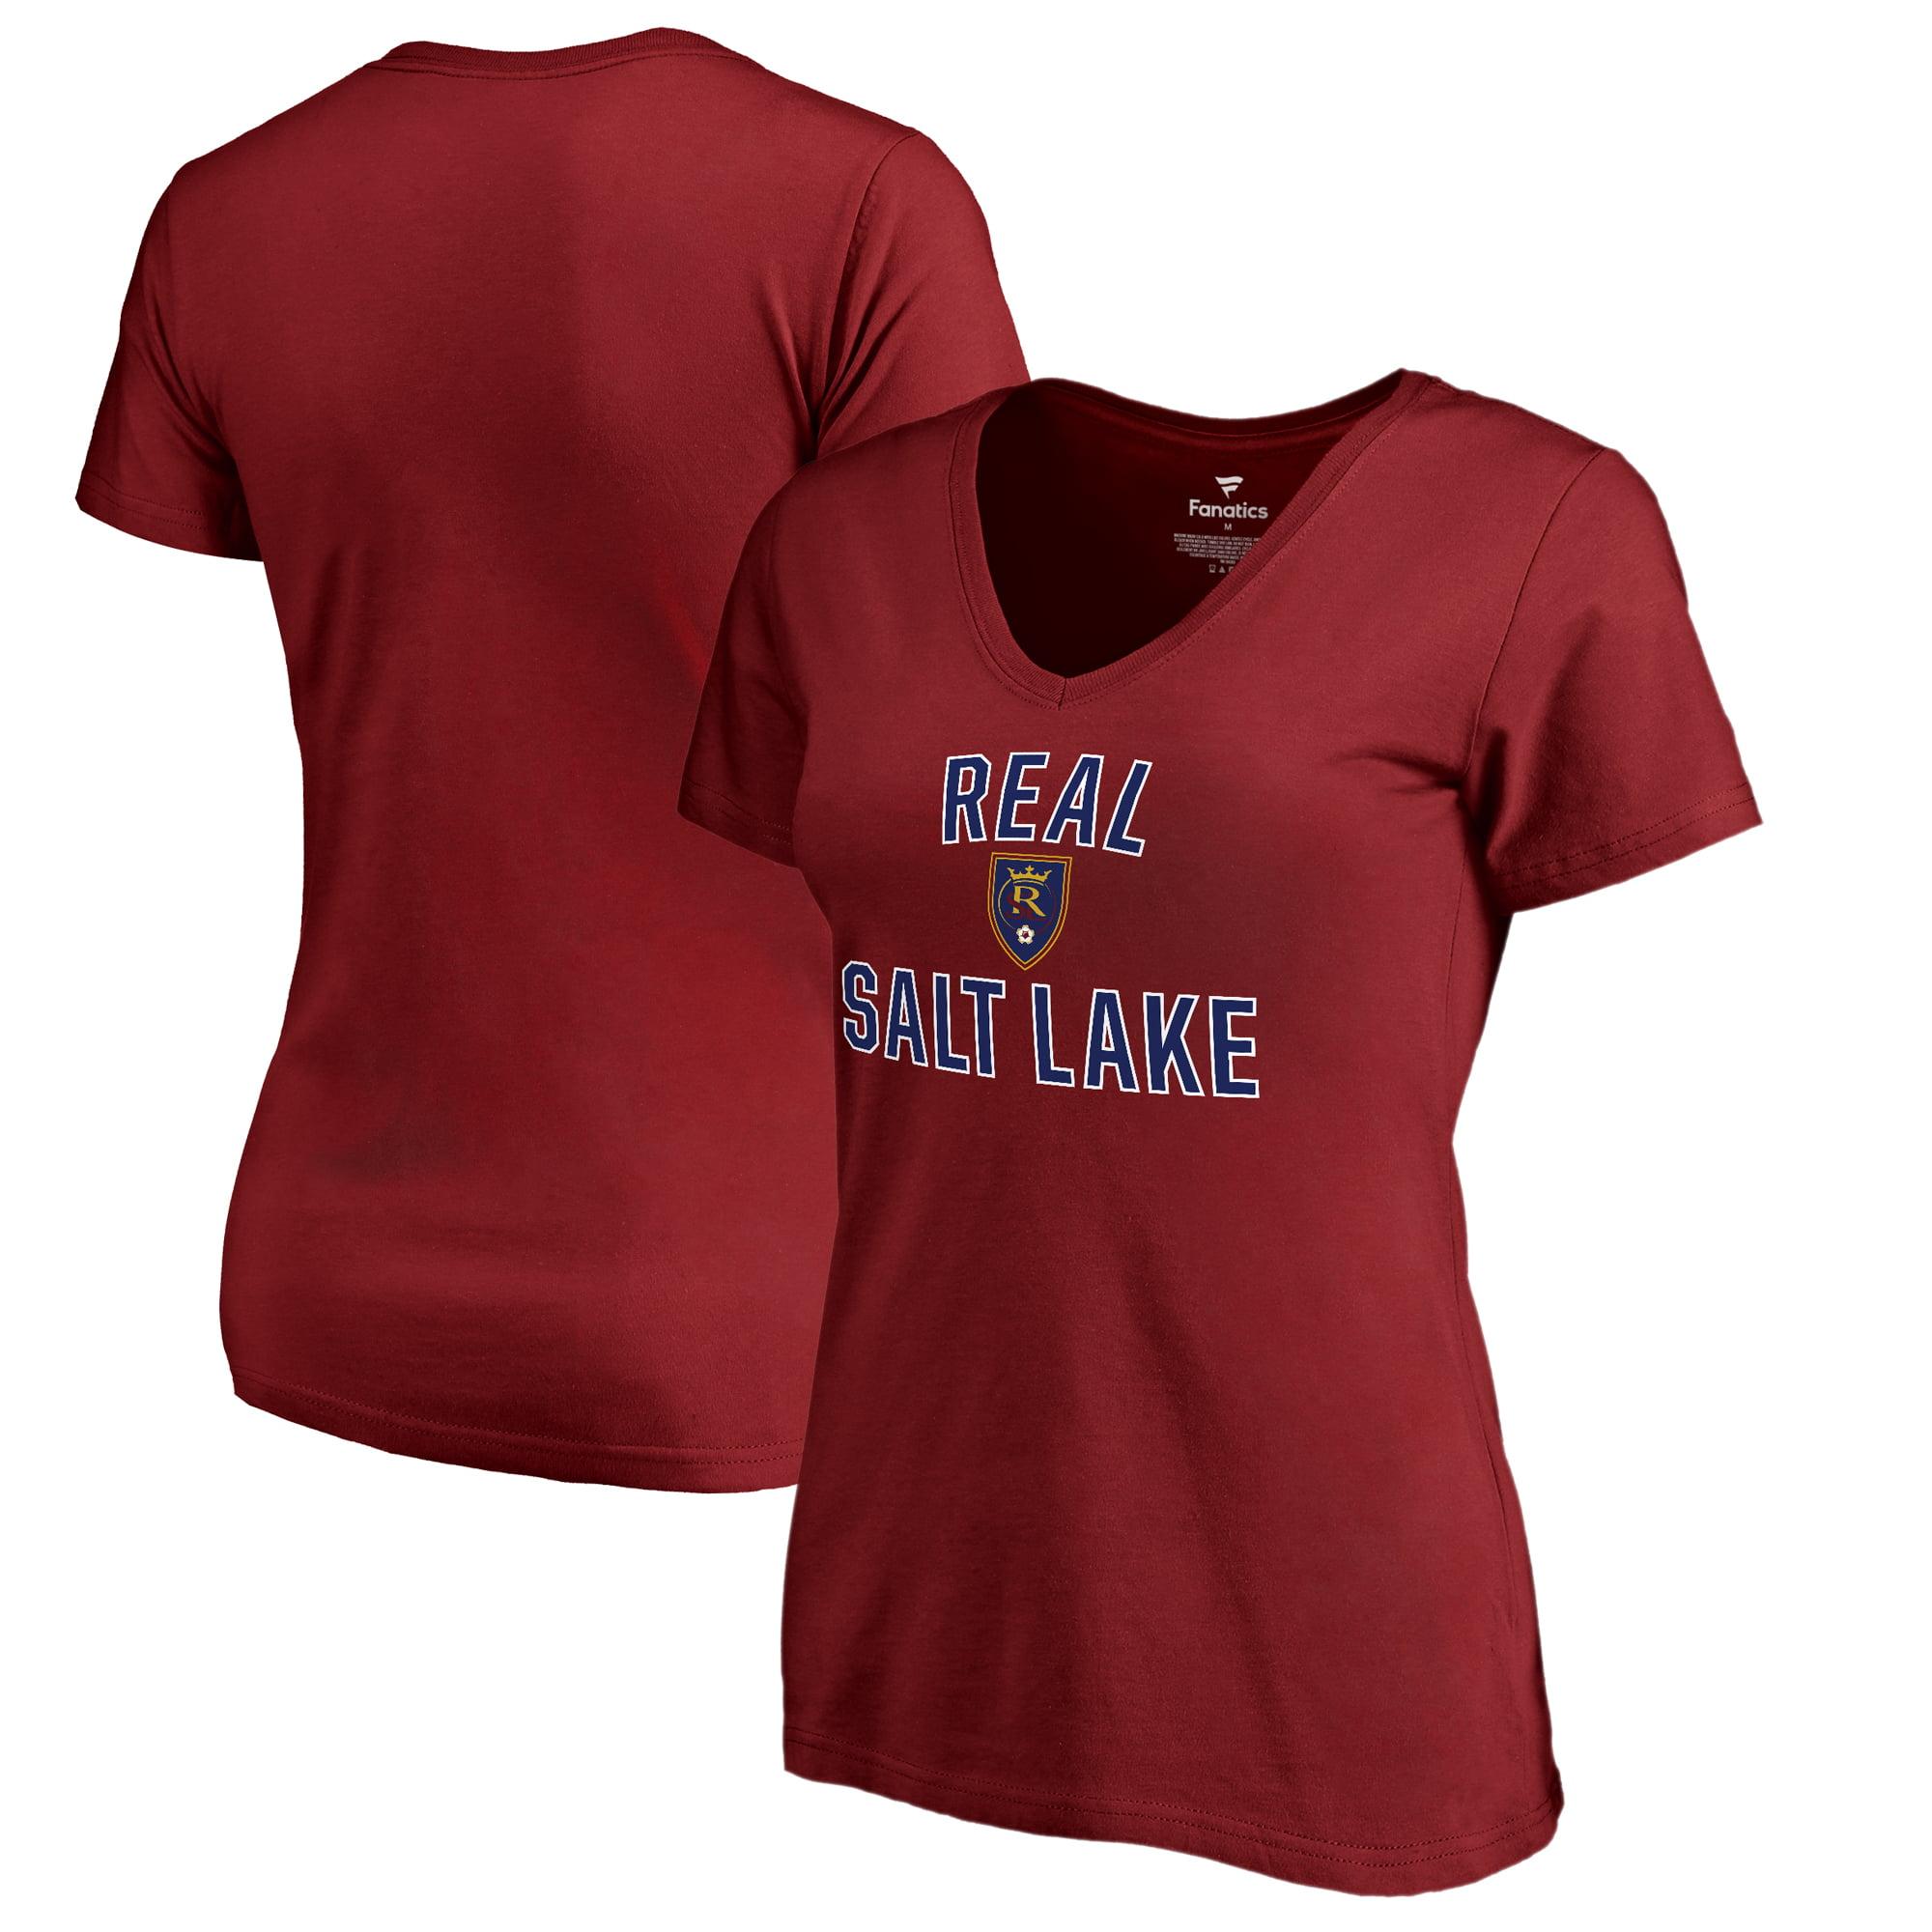 Real Salt Lake Fanatics Branded Women's Victory Arch V-Neck T-Shirt - Cardinal